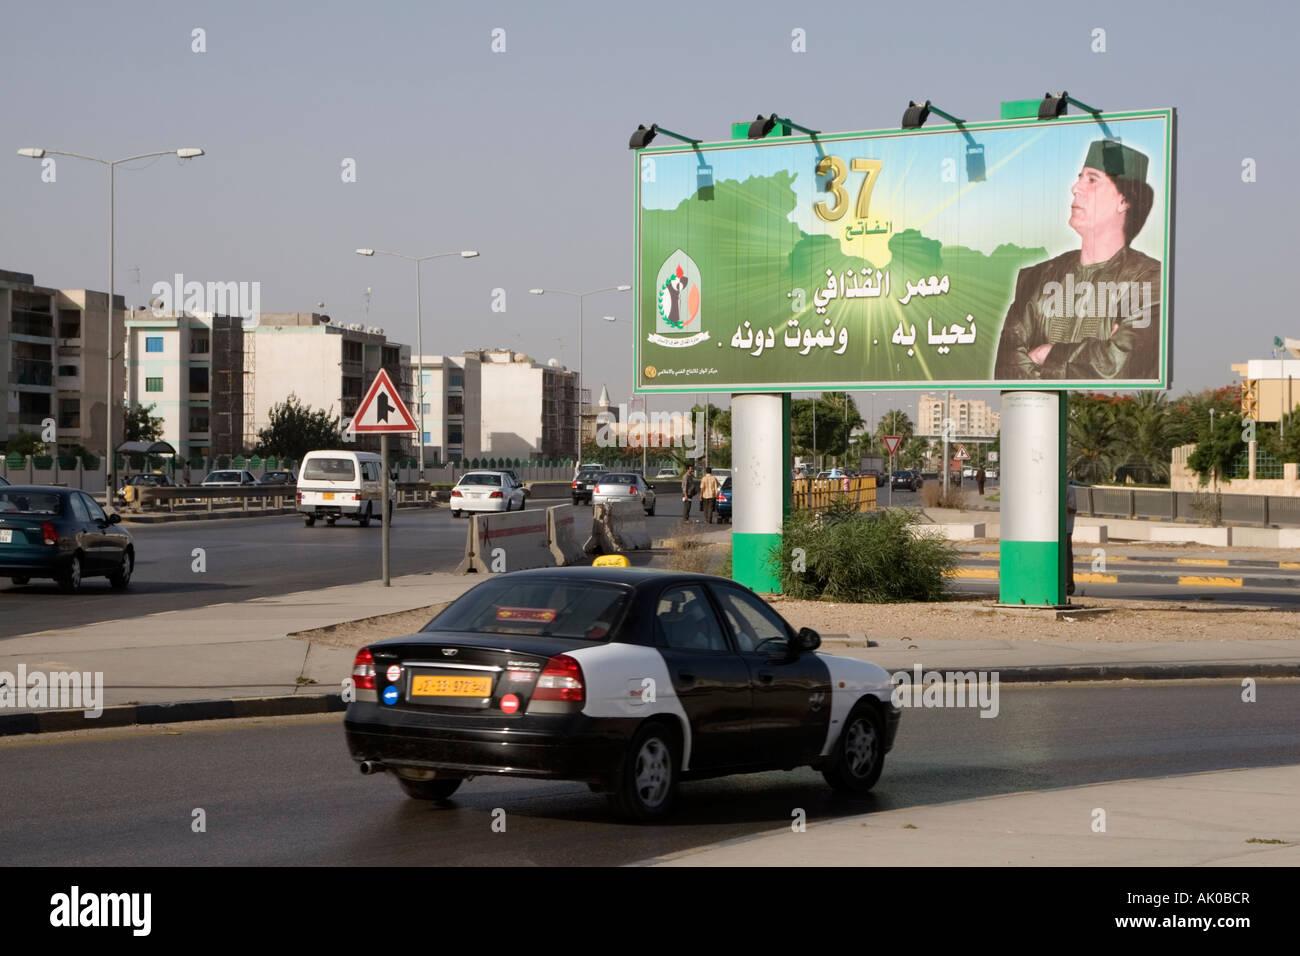 Tripoli, Libya. Street Scene, Qadhafi Billboard, 37th Anniversary of the Revolution, Taxi - Stock Image